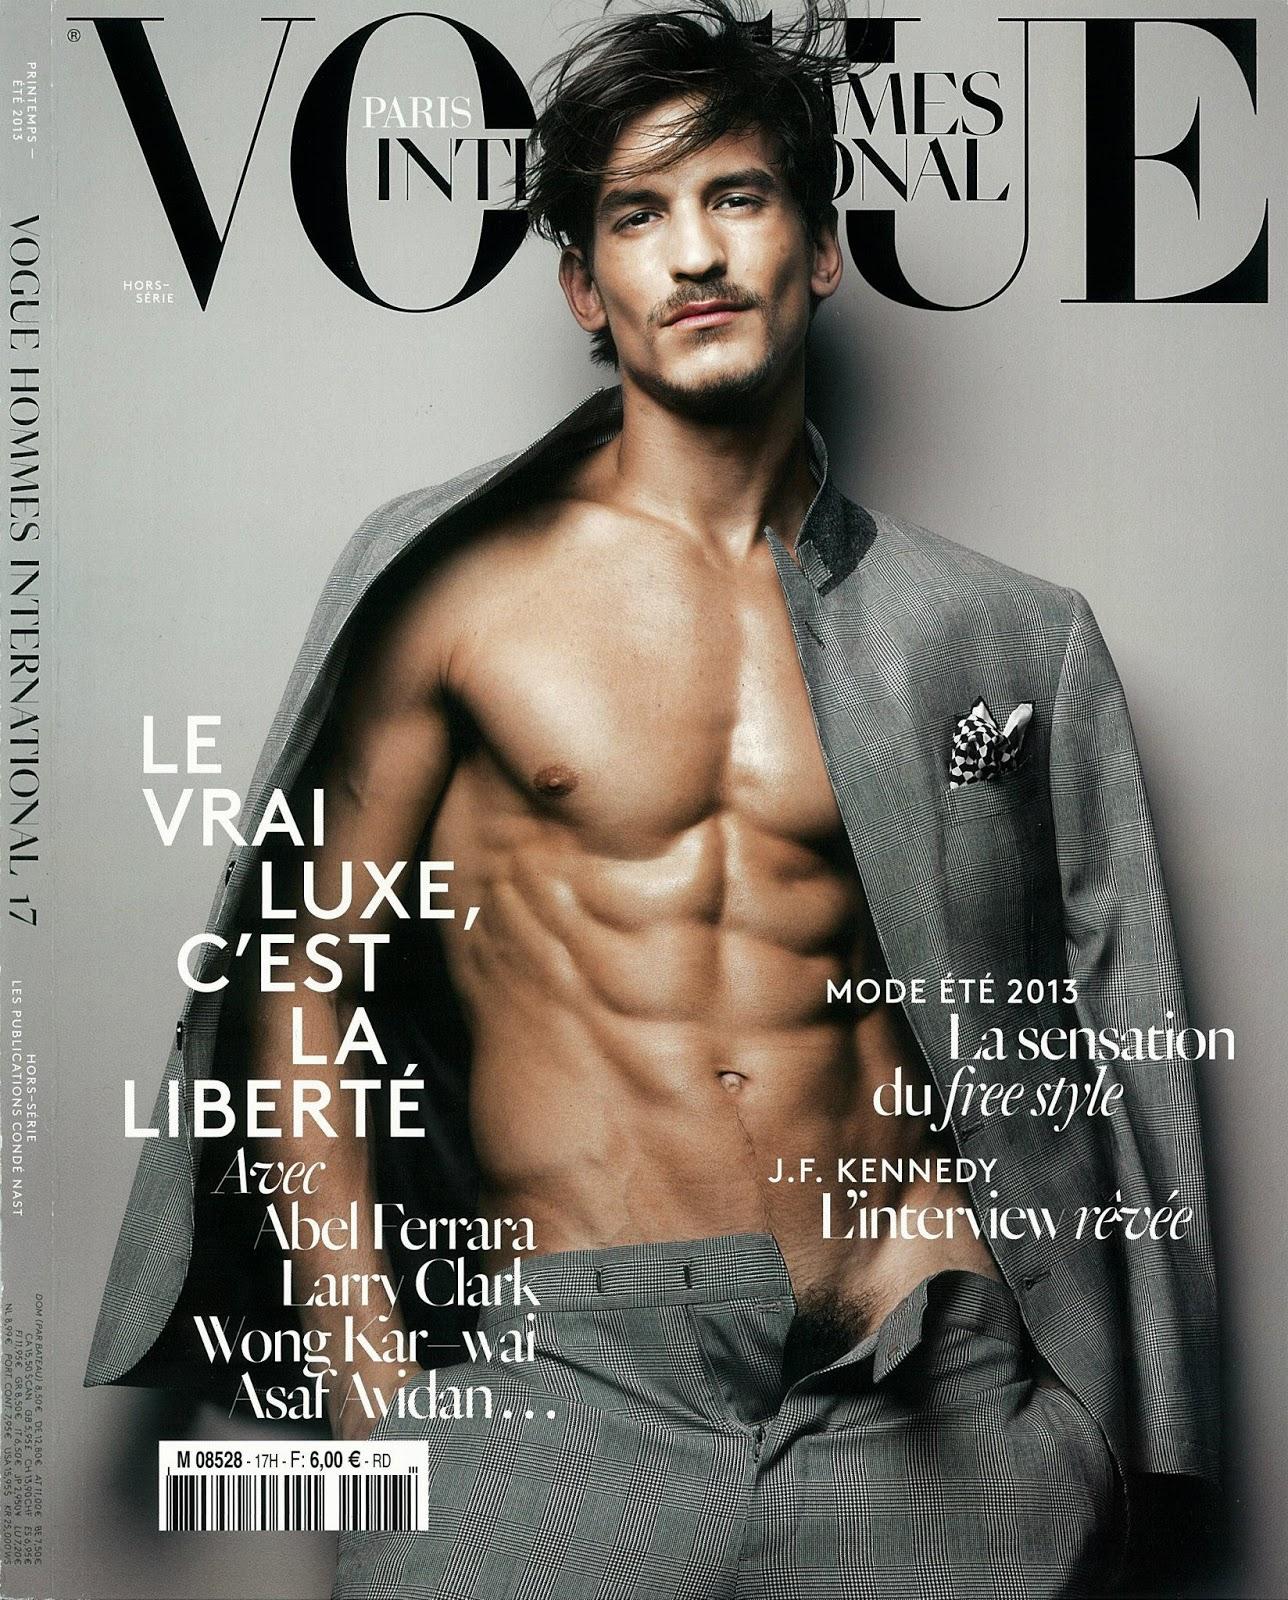 Jarrod-Scott-Vogue-nude-frontal-naked-pelado-1